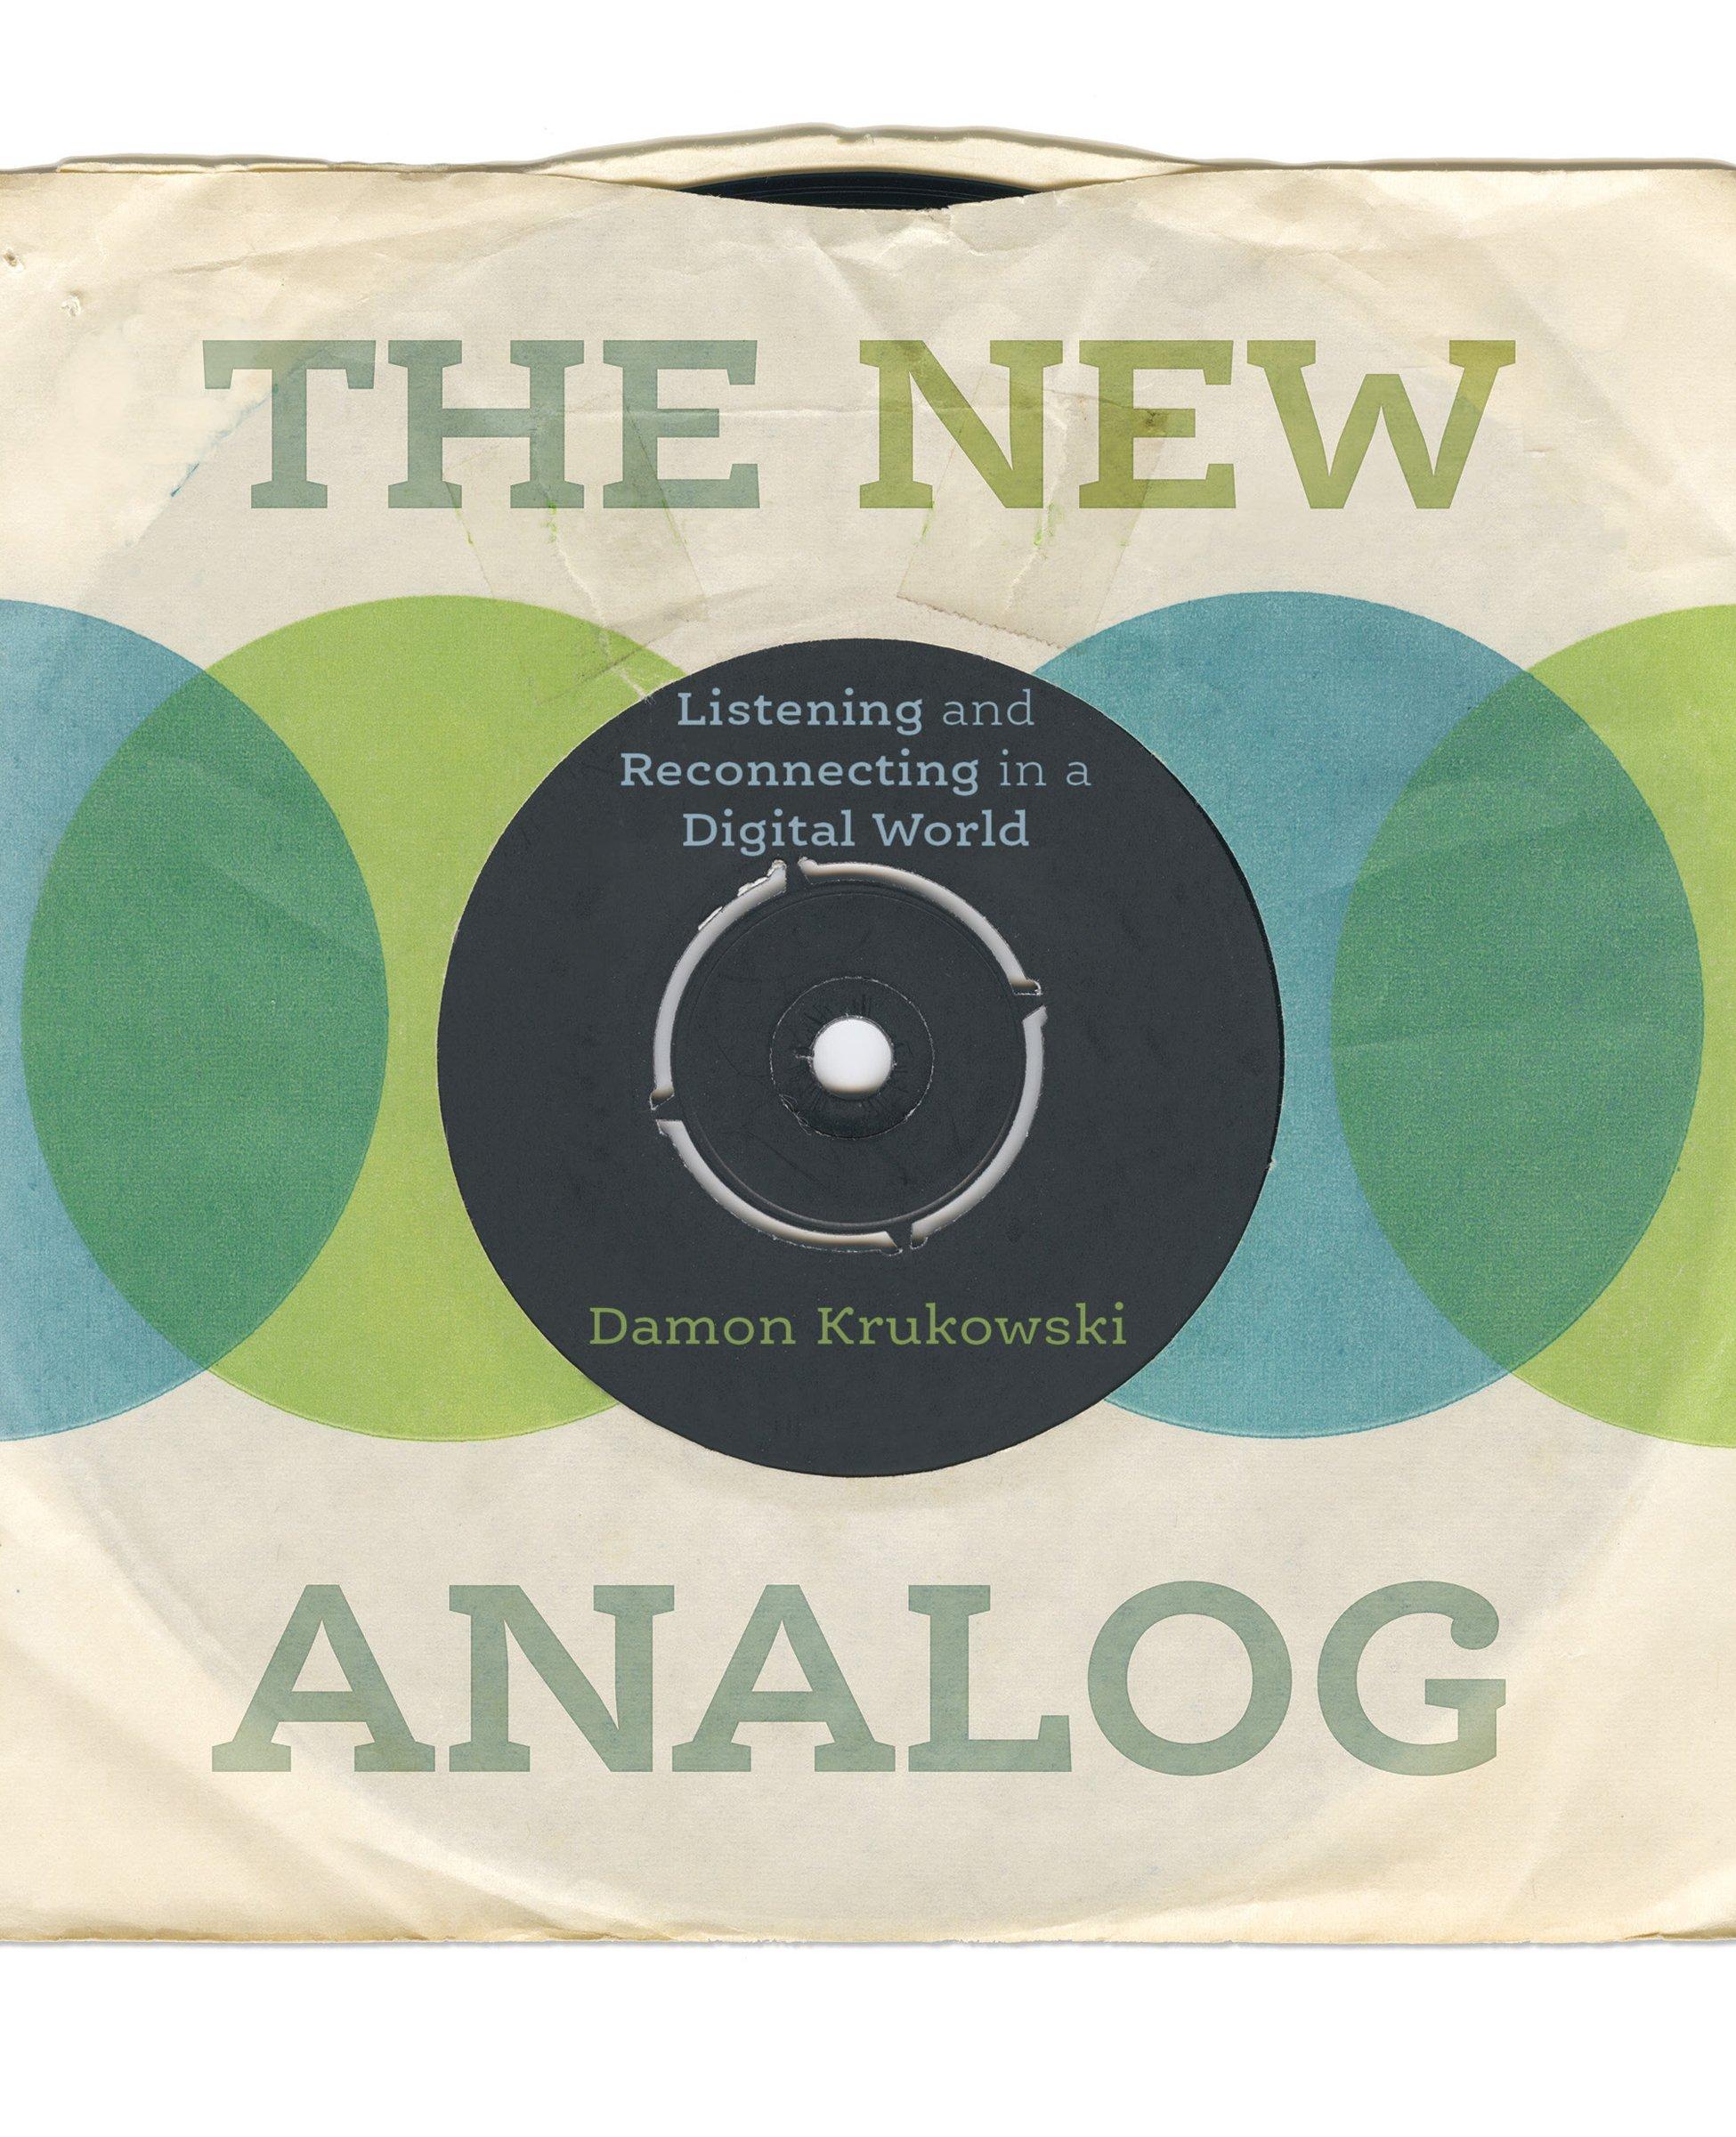 The New Analog: Listening and Reconnecting in a Digital World:  Amazon.co.uk: Damon Krukowski: 9781620971970: Books